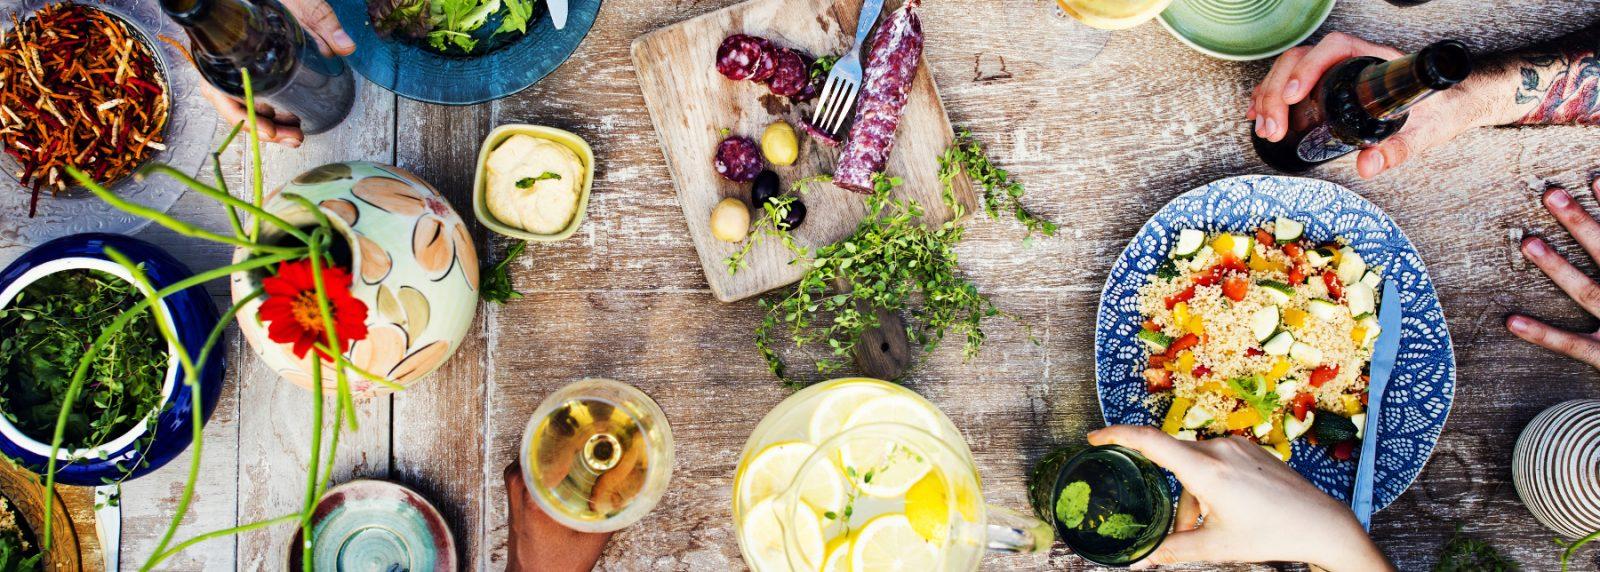 Wiosna, wino i nowalijki